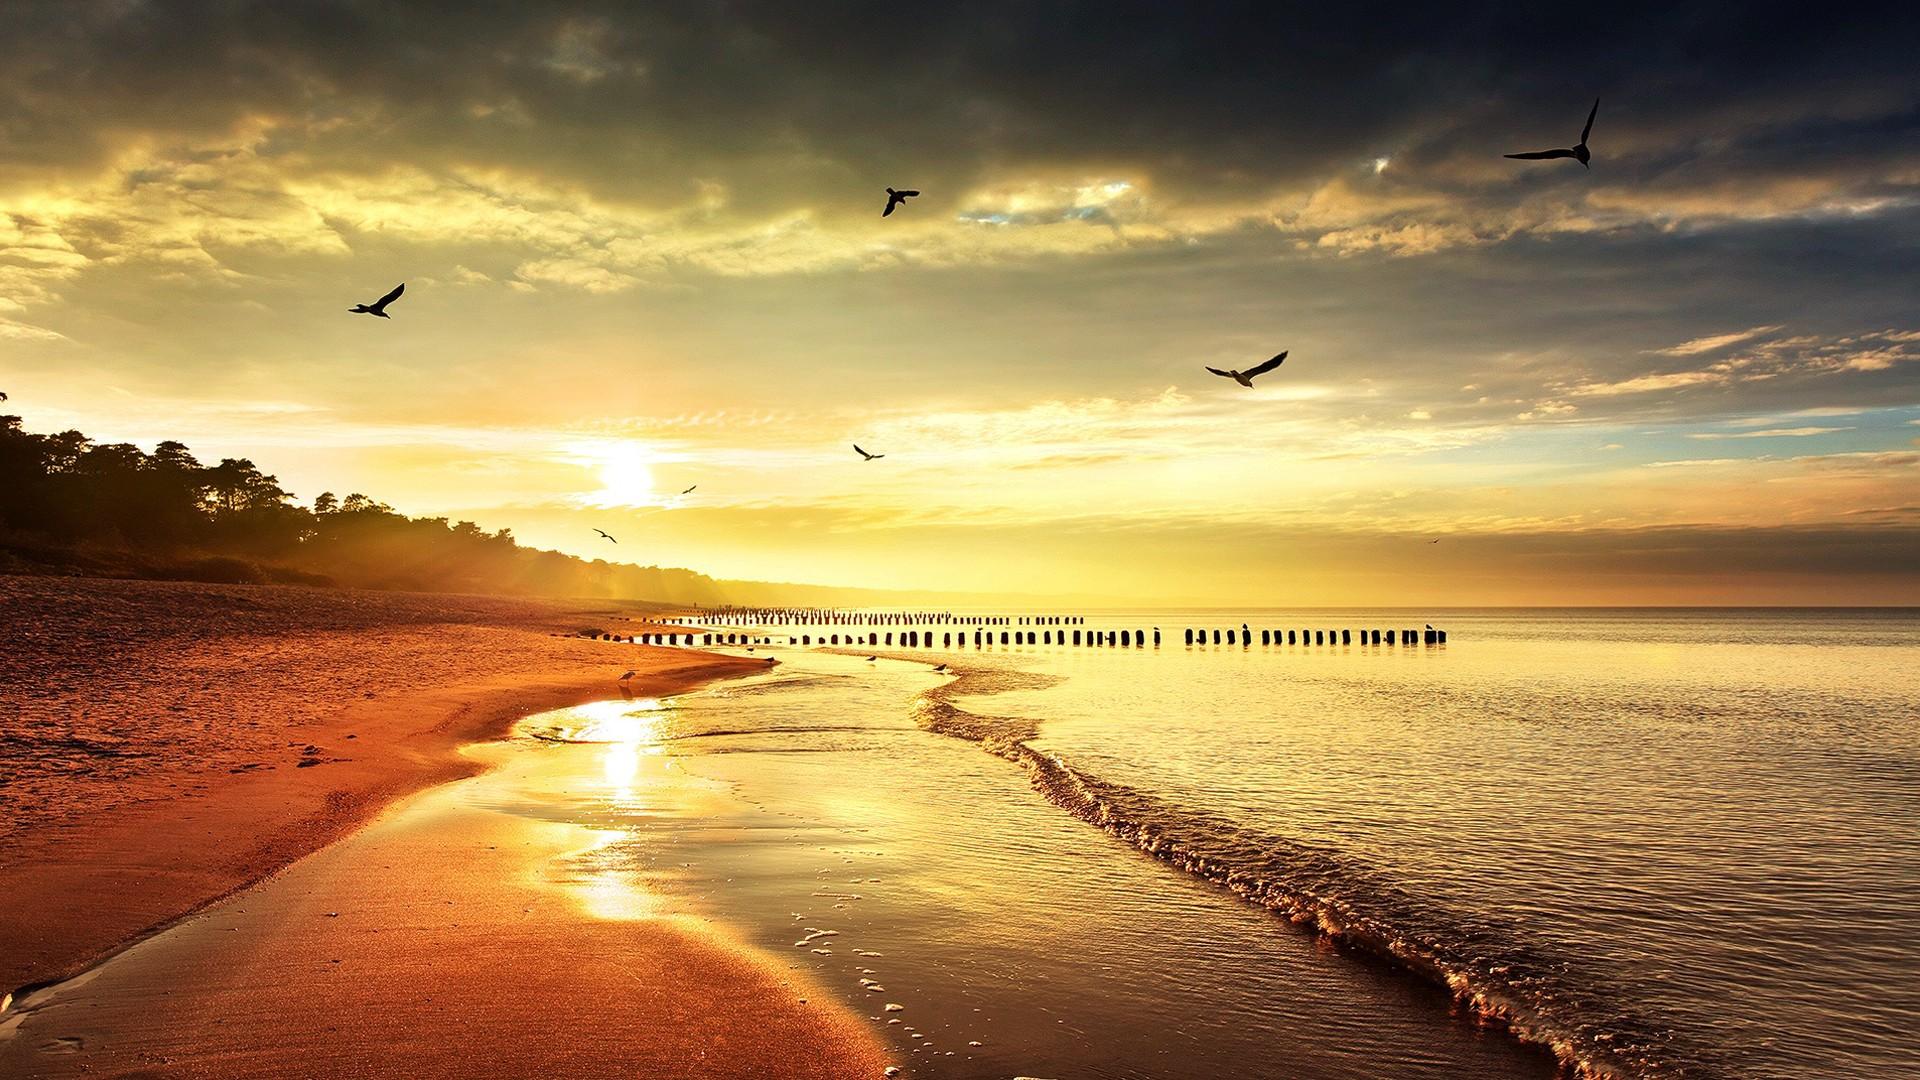 Happy Thanksgiving 3d Wallpaper Sunset Beaches Hd Images Pixelstalk Net